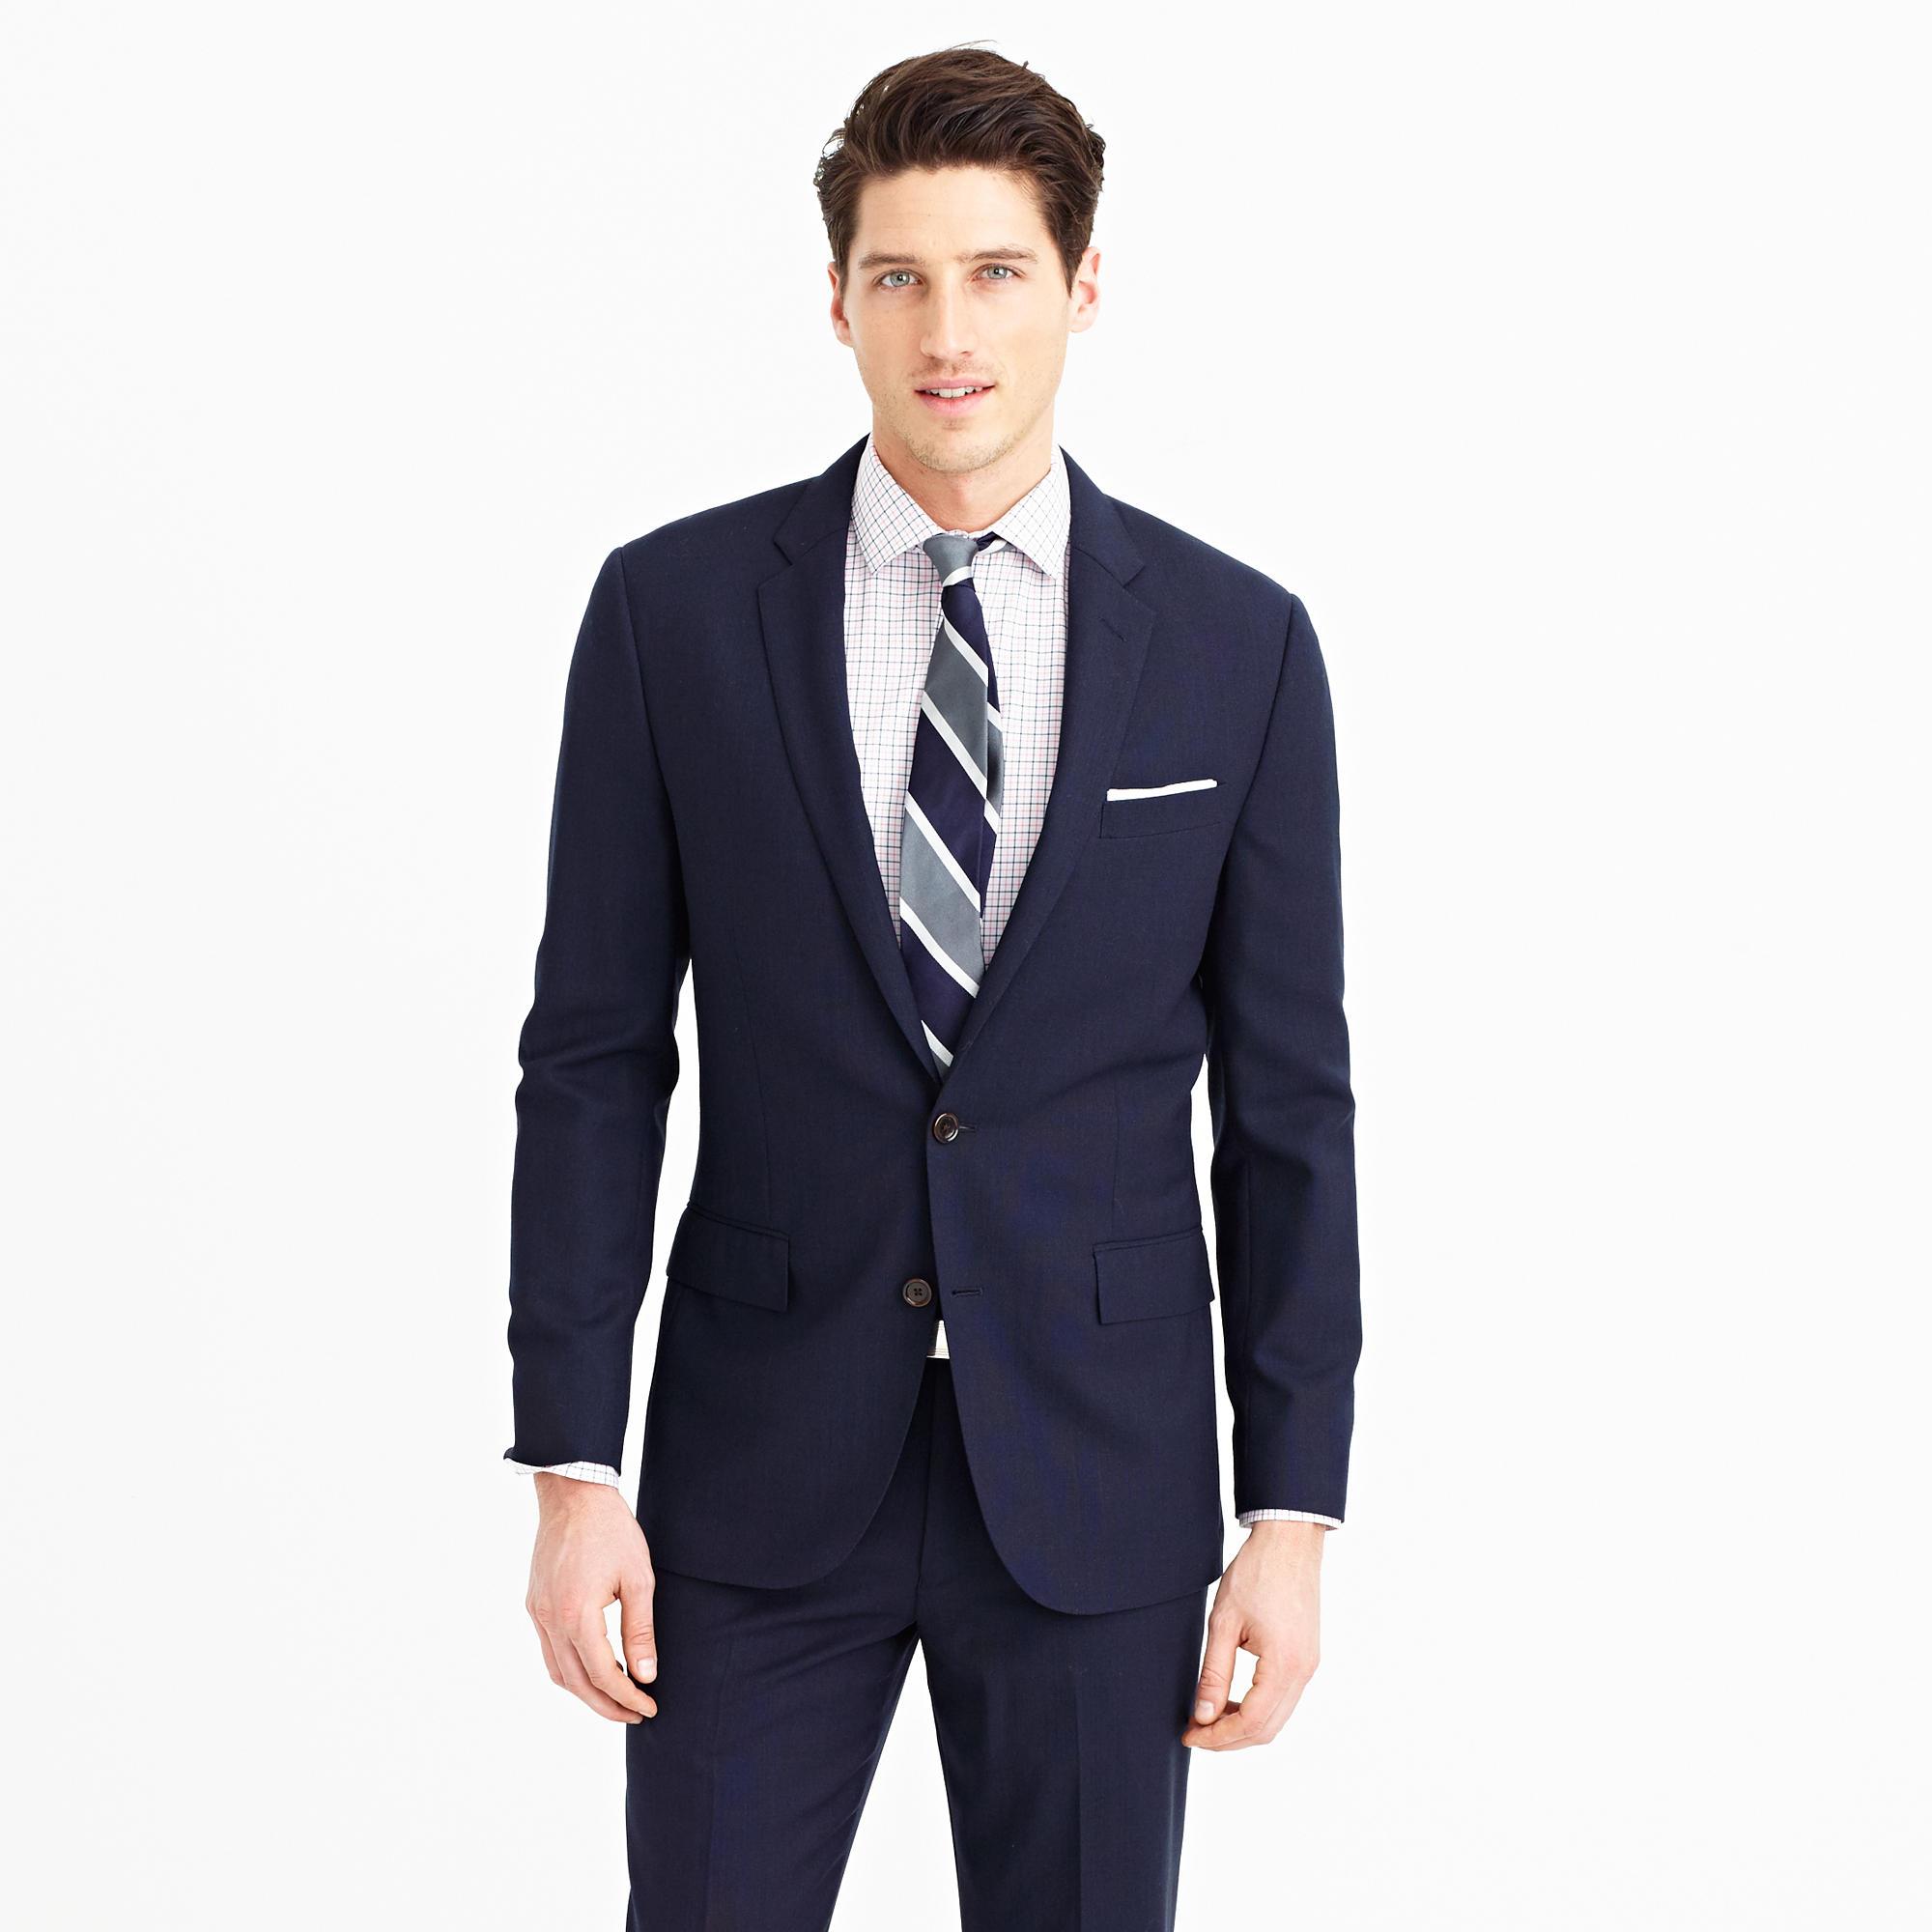 J Crew Traveler Suit Review